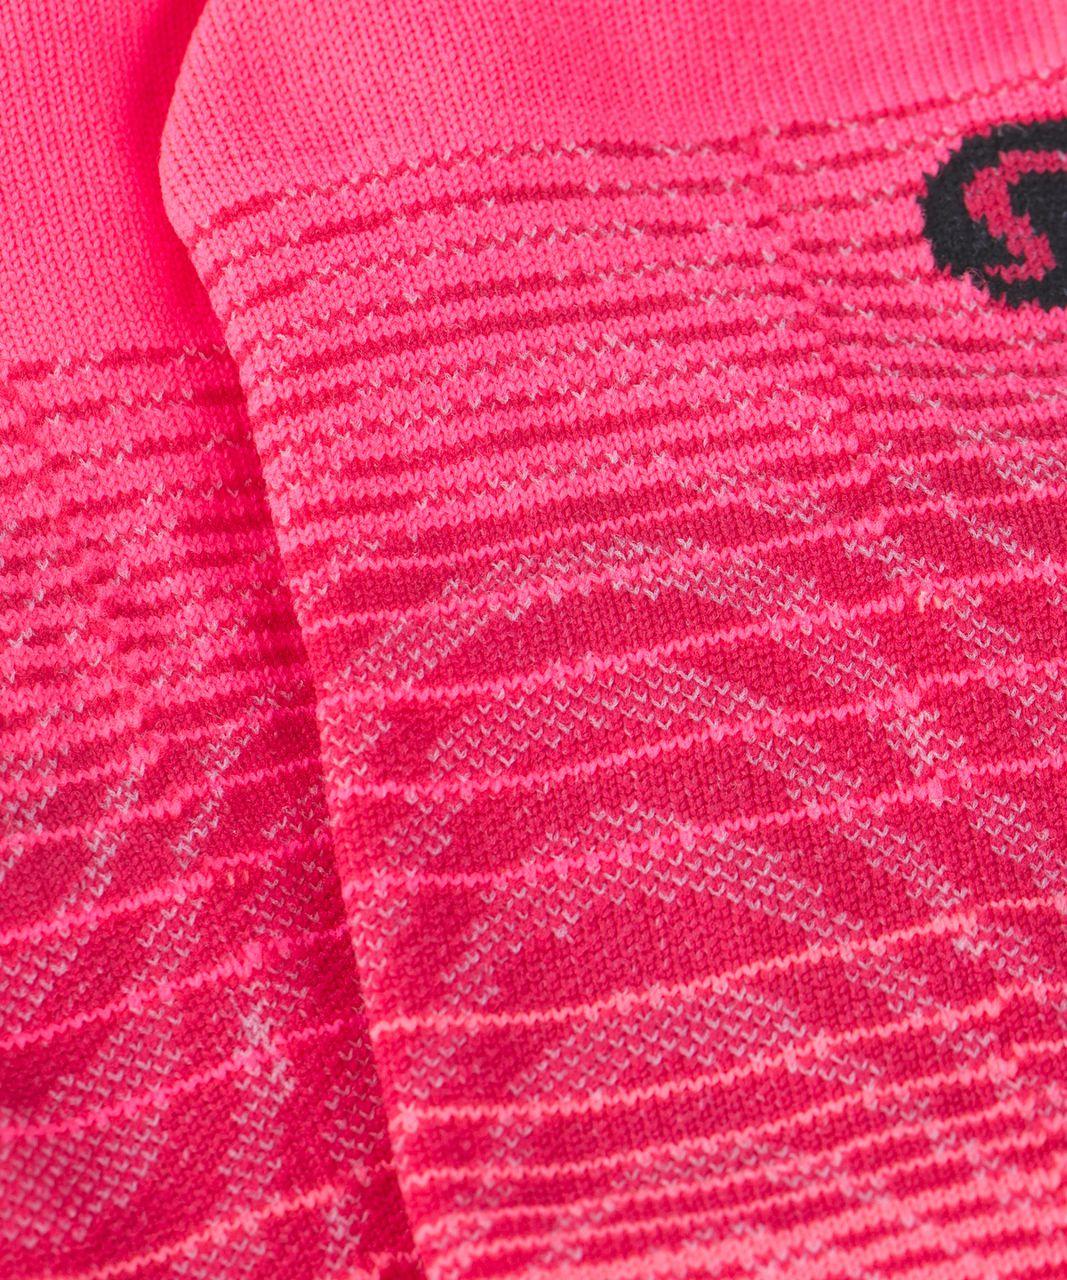 Lululemon Play All Day Sock - Neon Pink / Boom Juice / Grapefruit